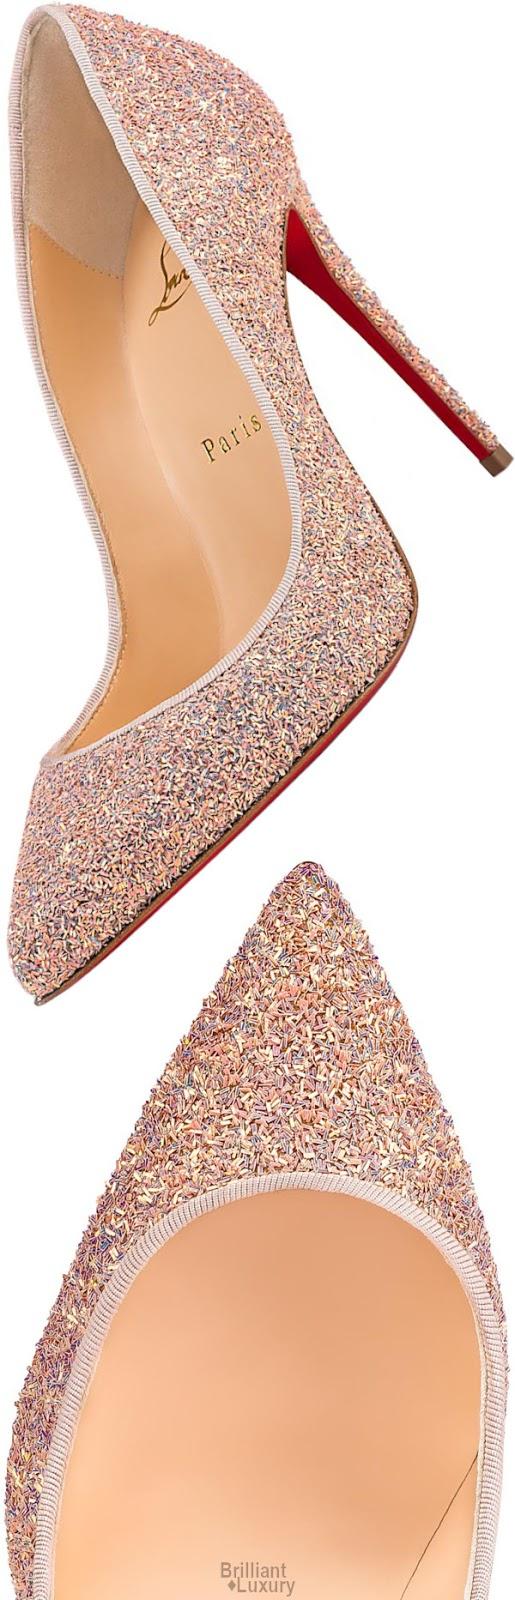 Brilliant Luxury♦Christian Louboutin Pigalle Follies Glitter Krypton Pump